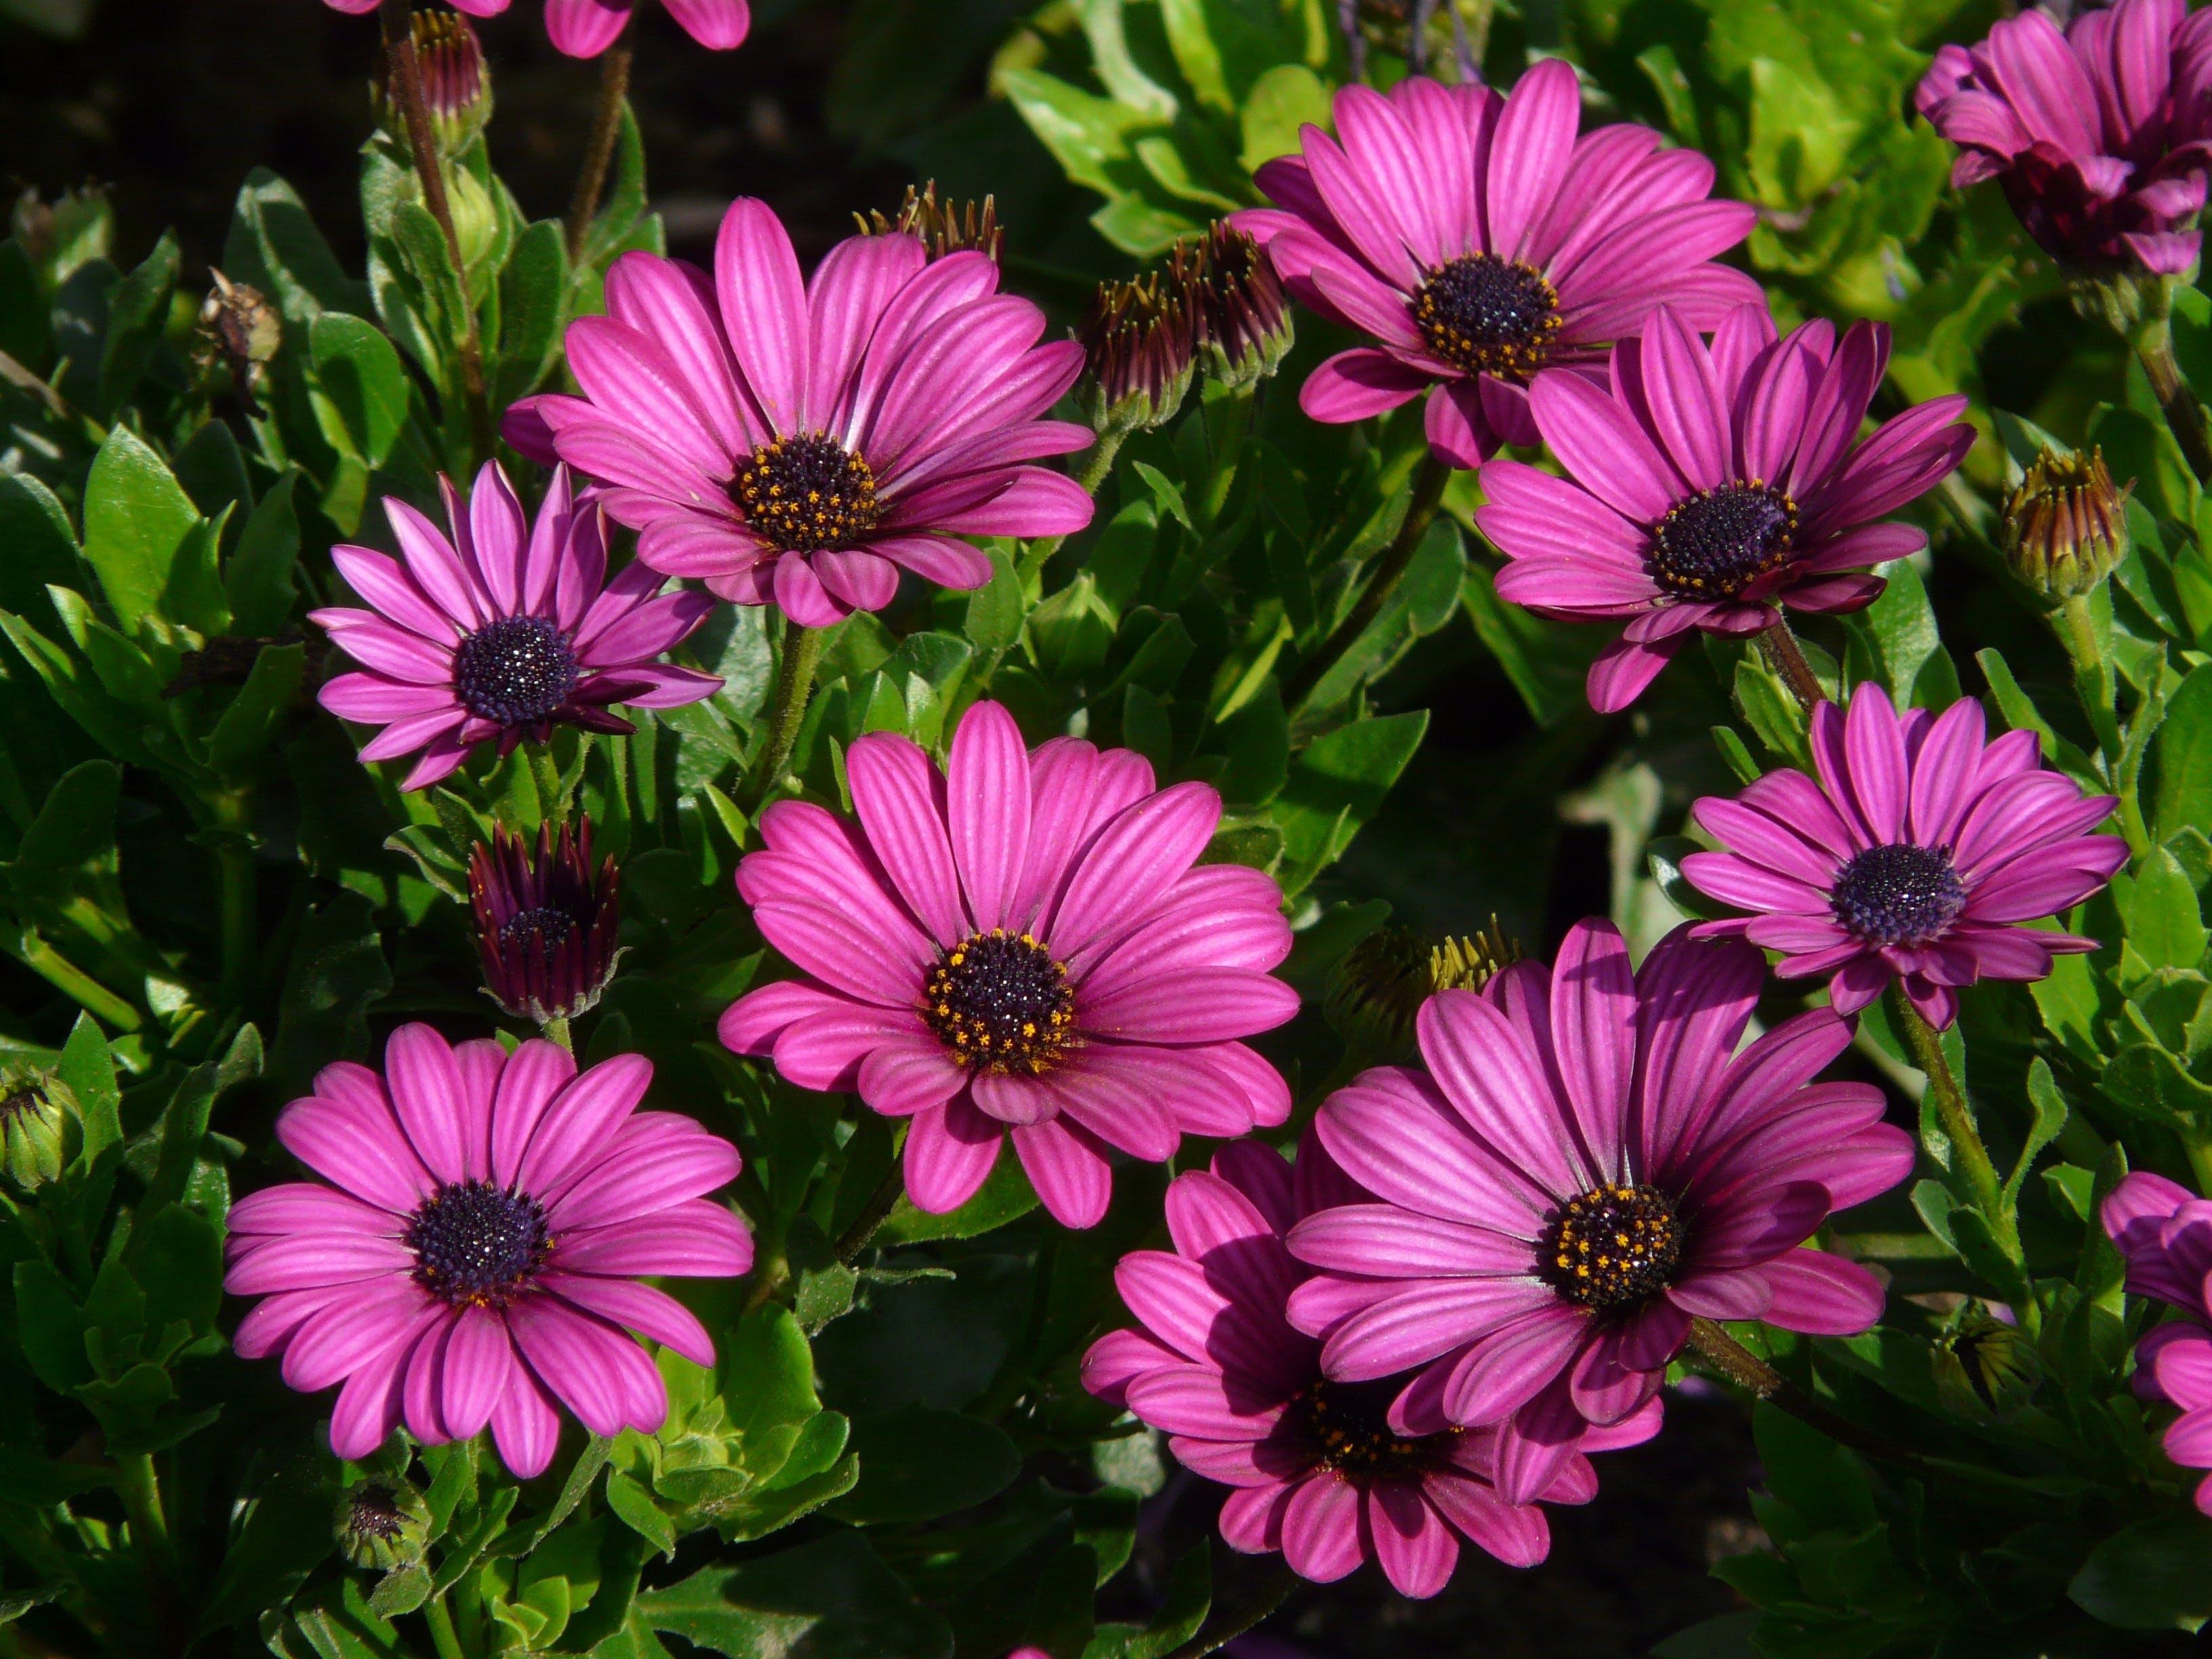 Purple Petal Flowers during Daytime